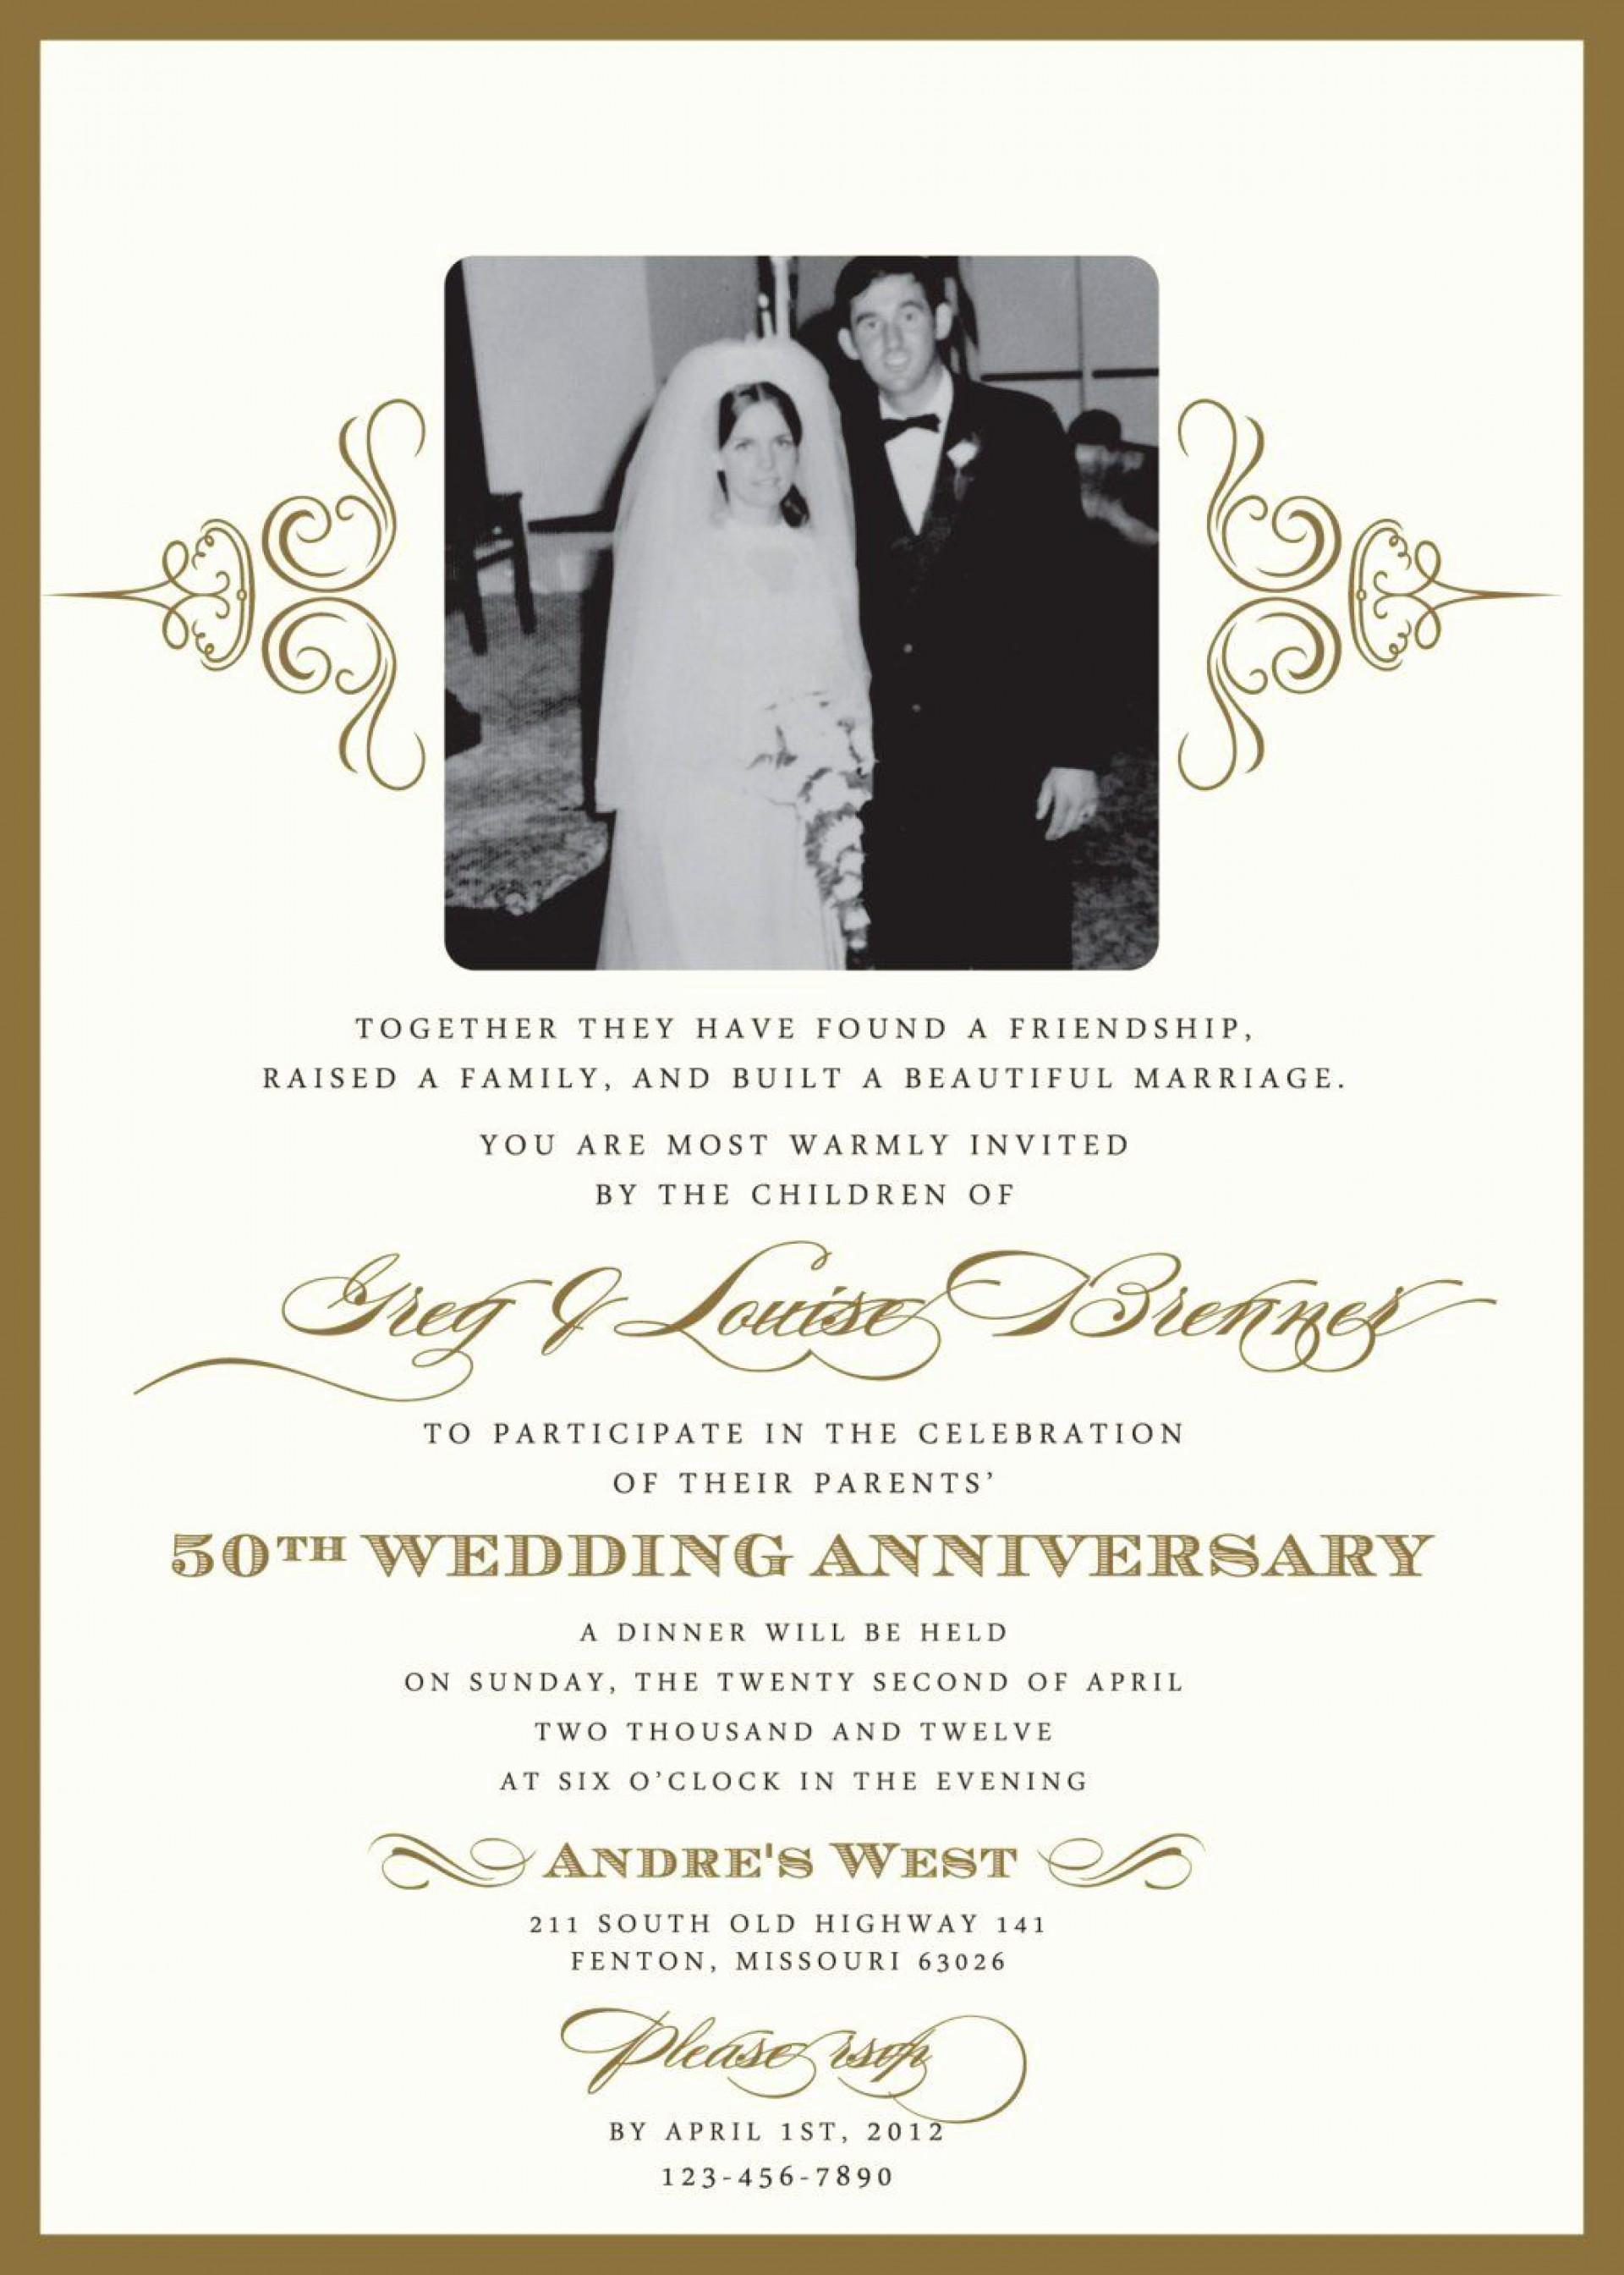 003 Astounding 50th Wedding Anniversary Invitation Template High Resolution  Templates Card Sample Golden1920